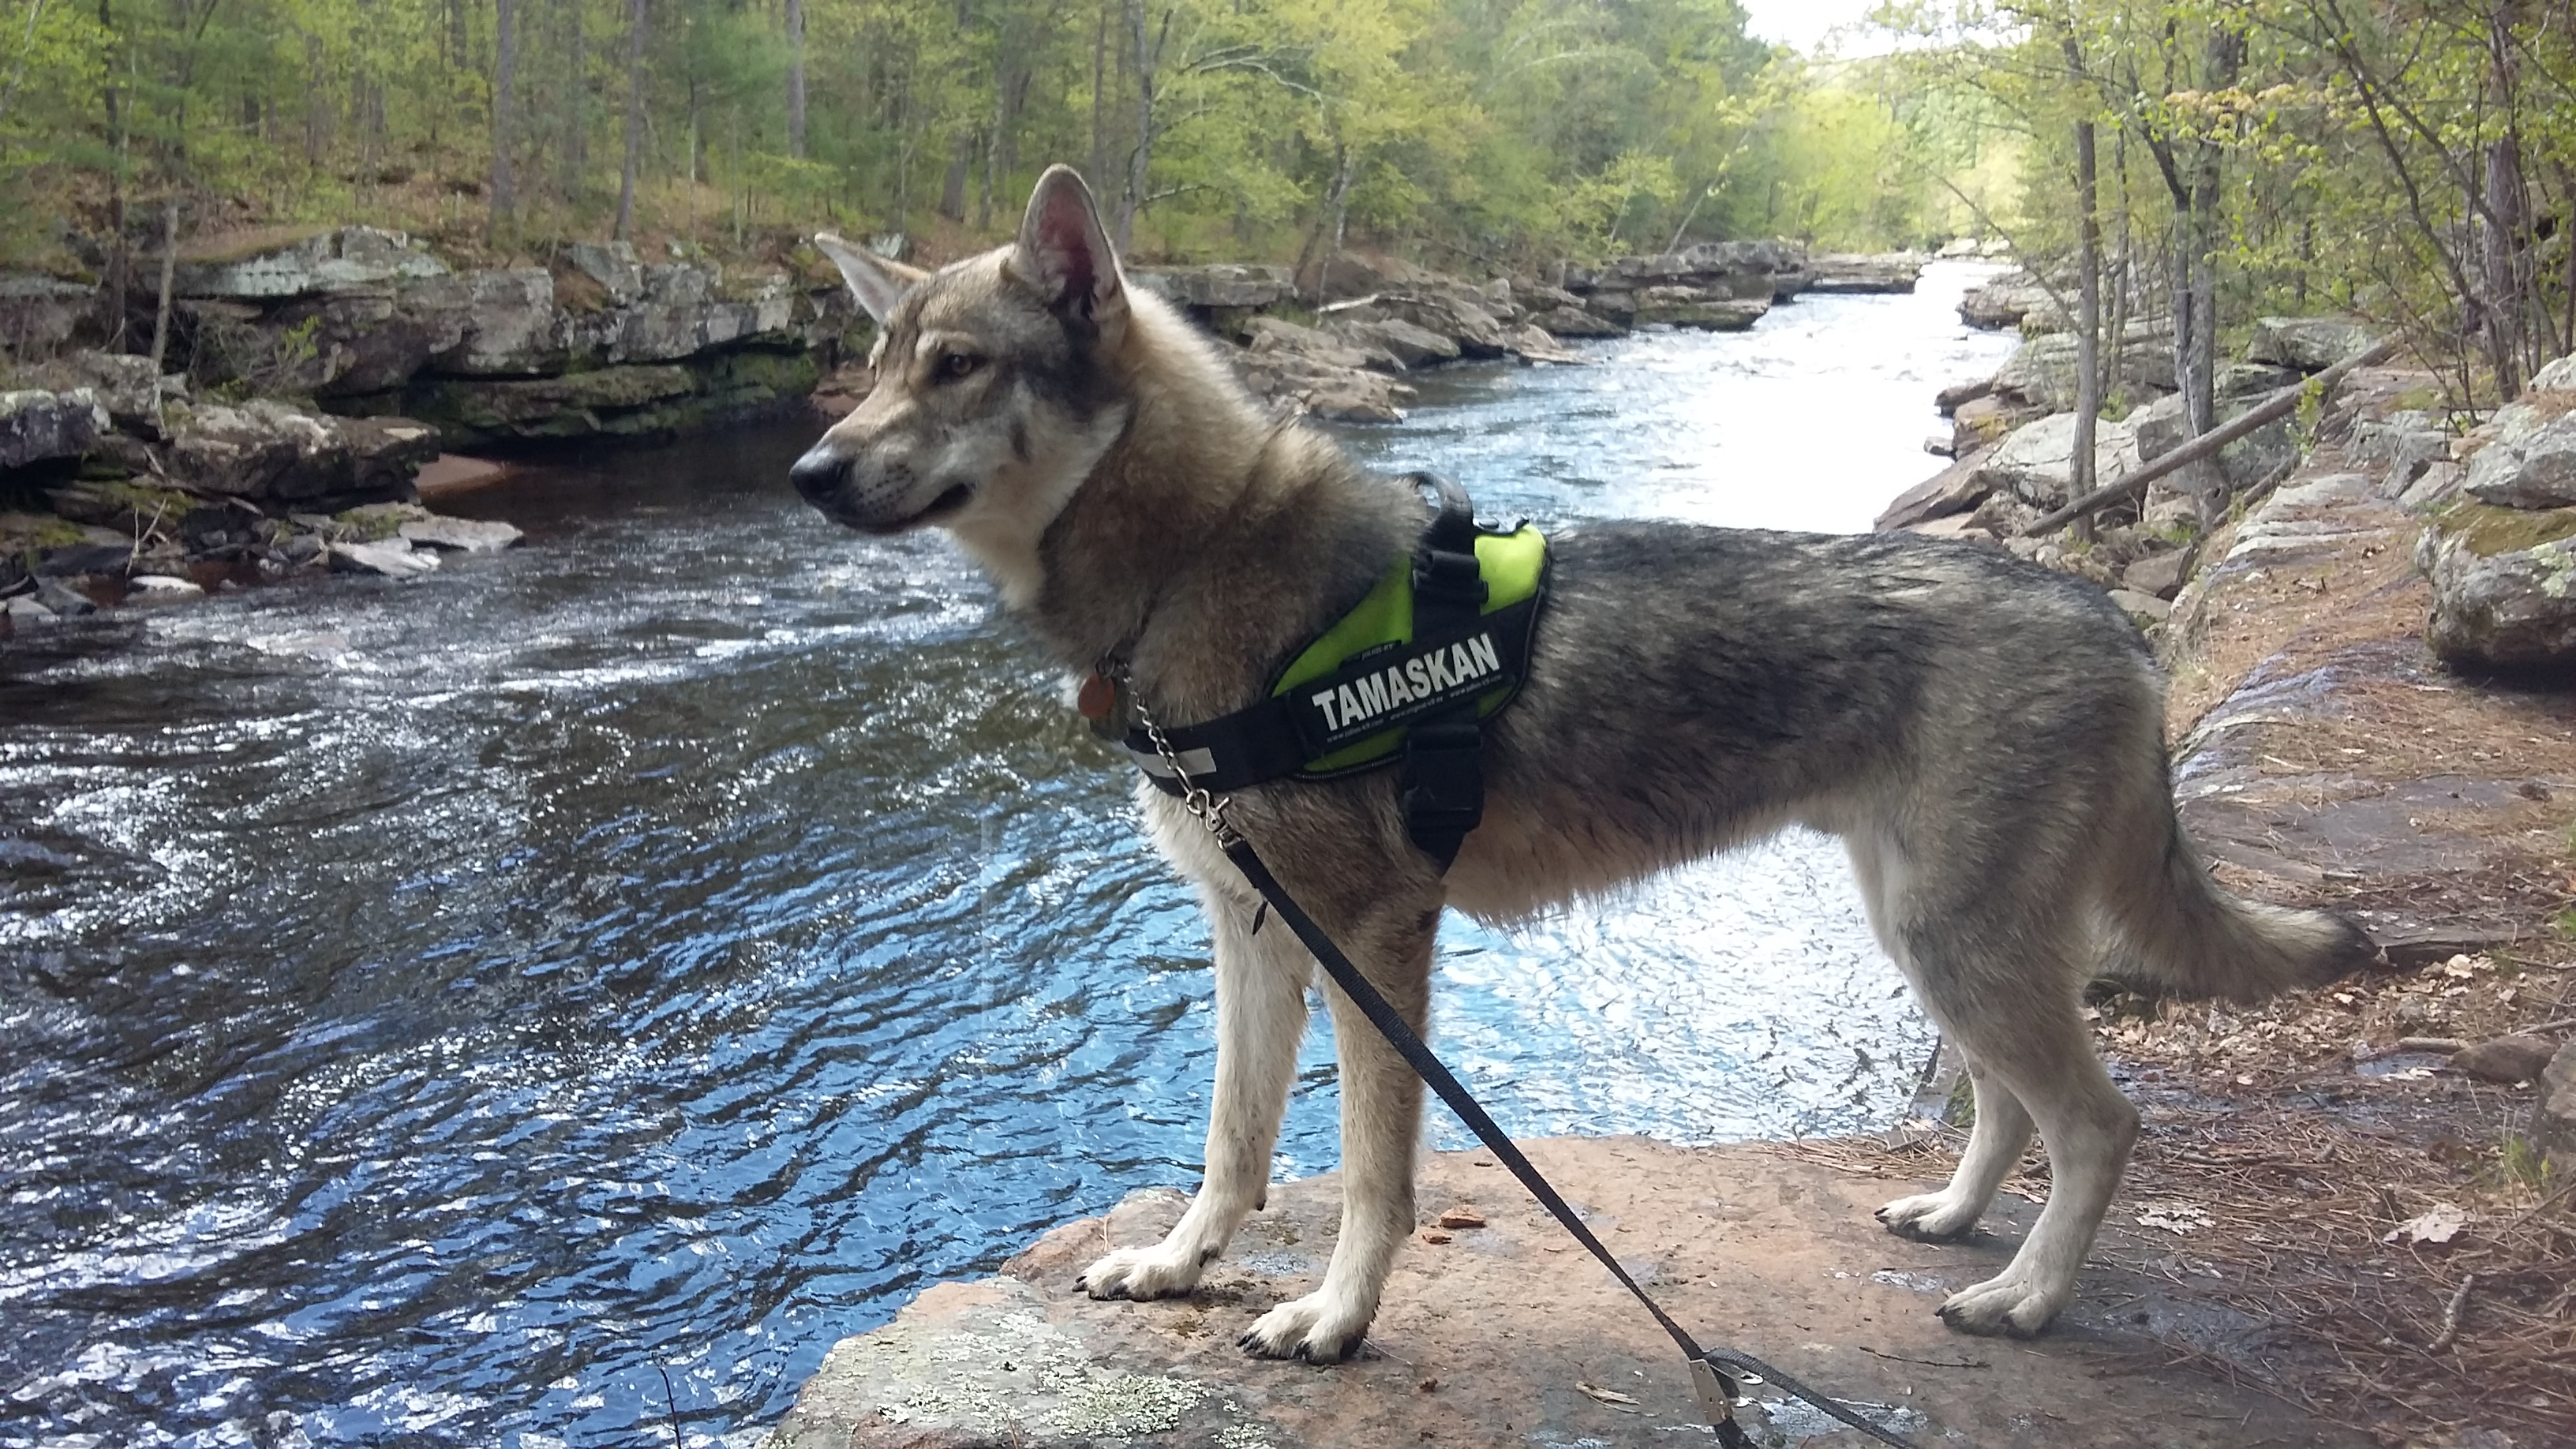 Tamaskan Dog Breed Standards